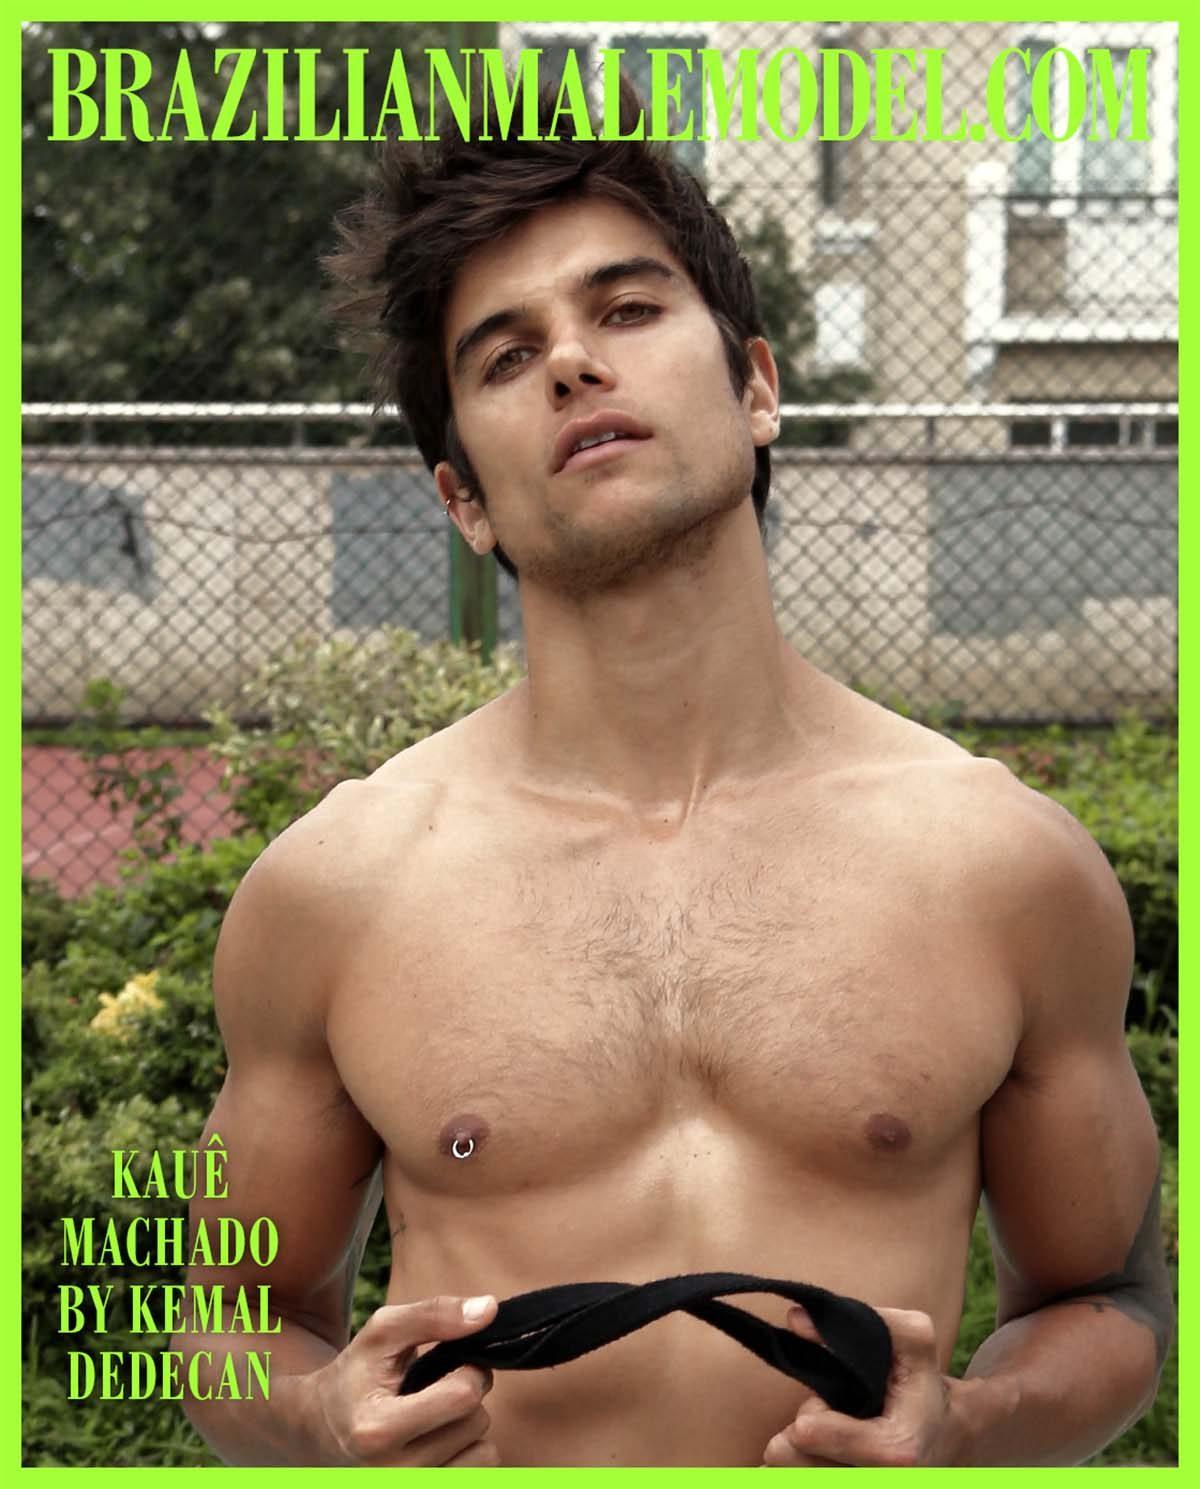 Kauê Machado by Kemal Dedecan